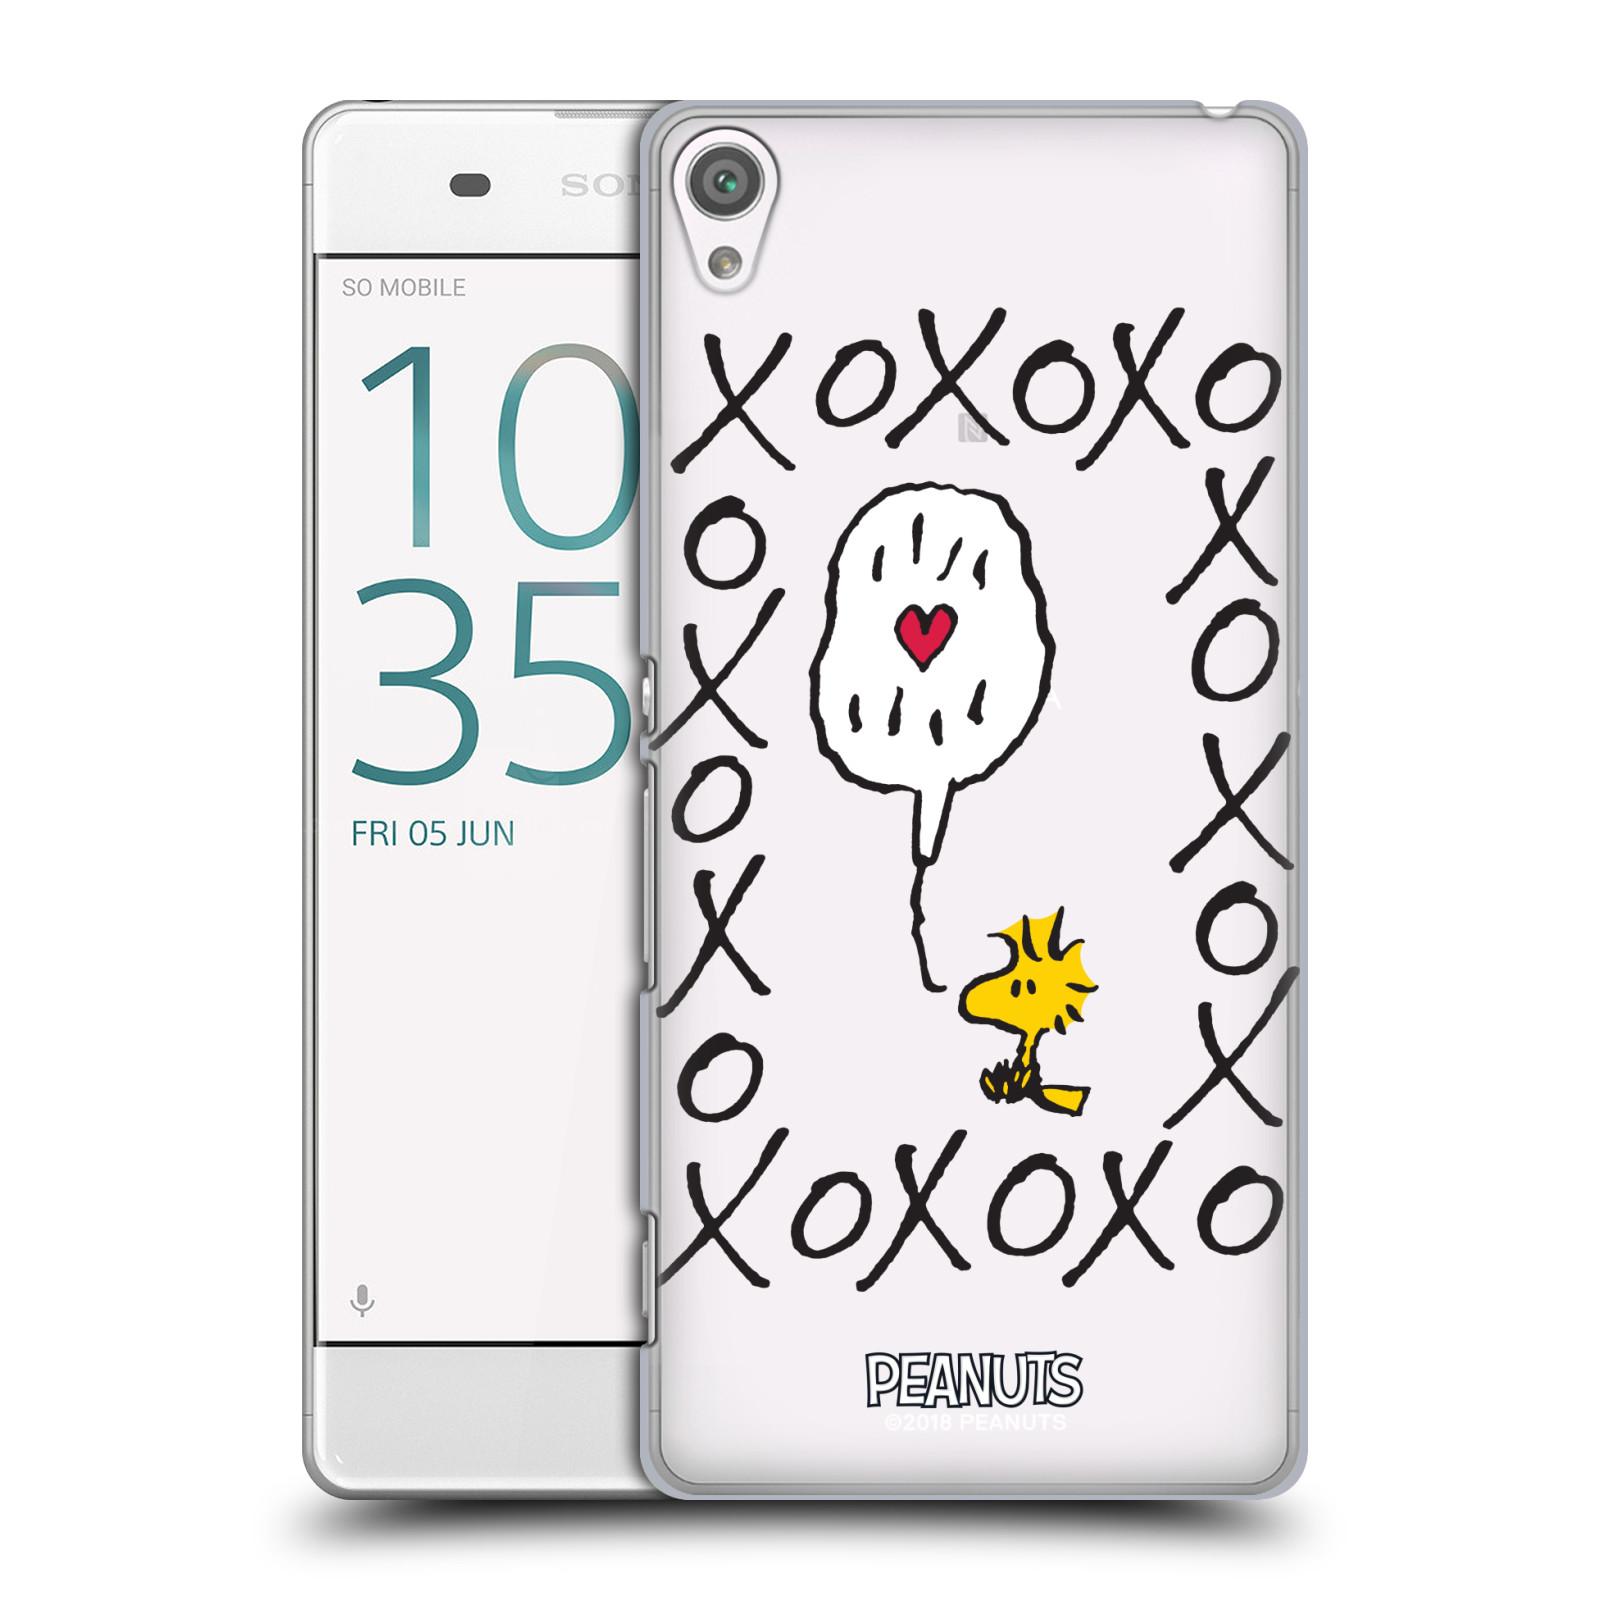 Pouzdro na mobil Sony Xperia XA Oficiální motiv Peanuts ptáček Woodstock srdíčko